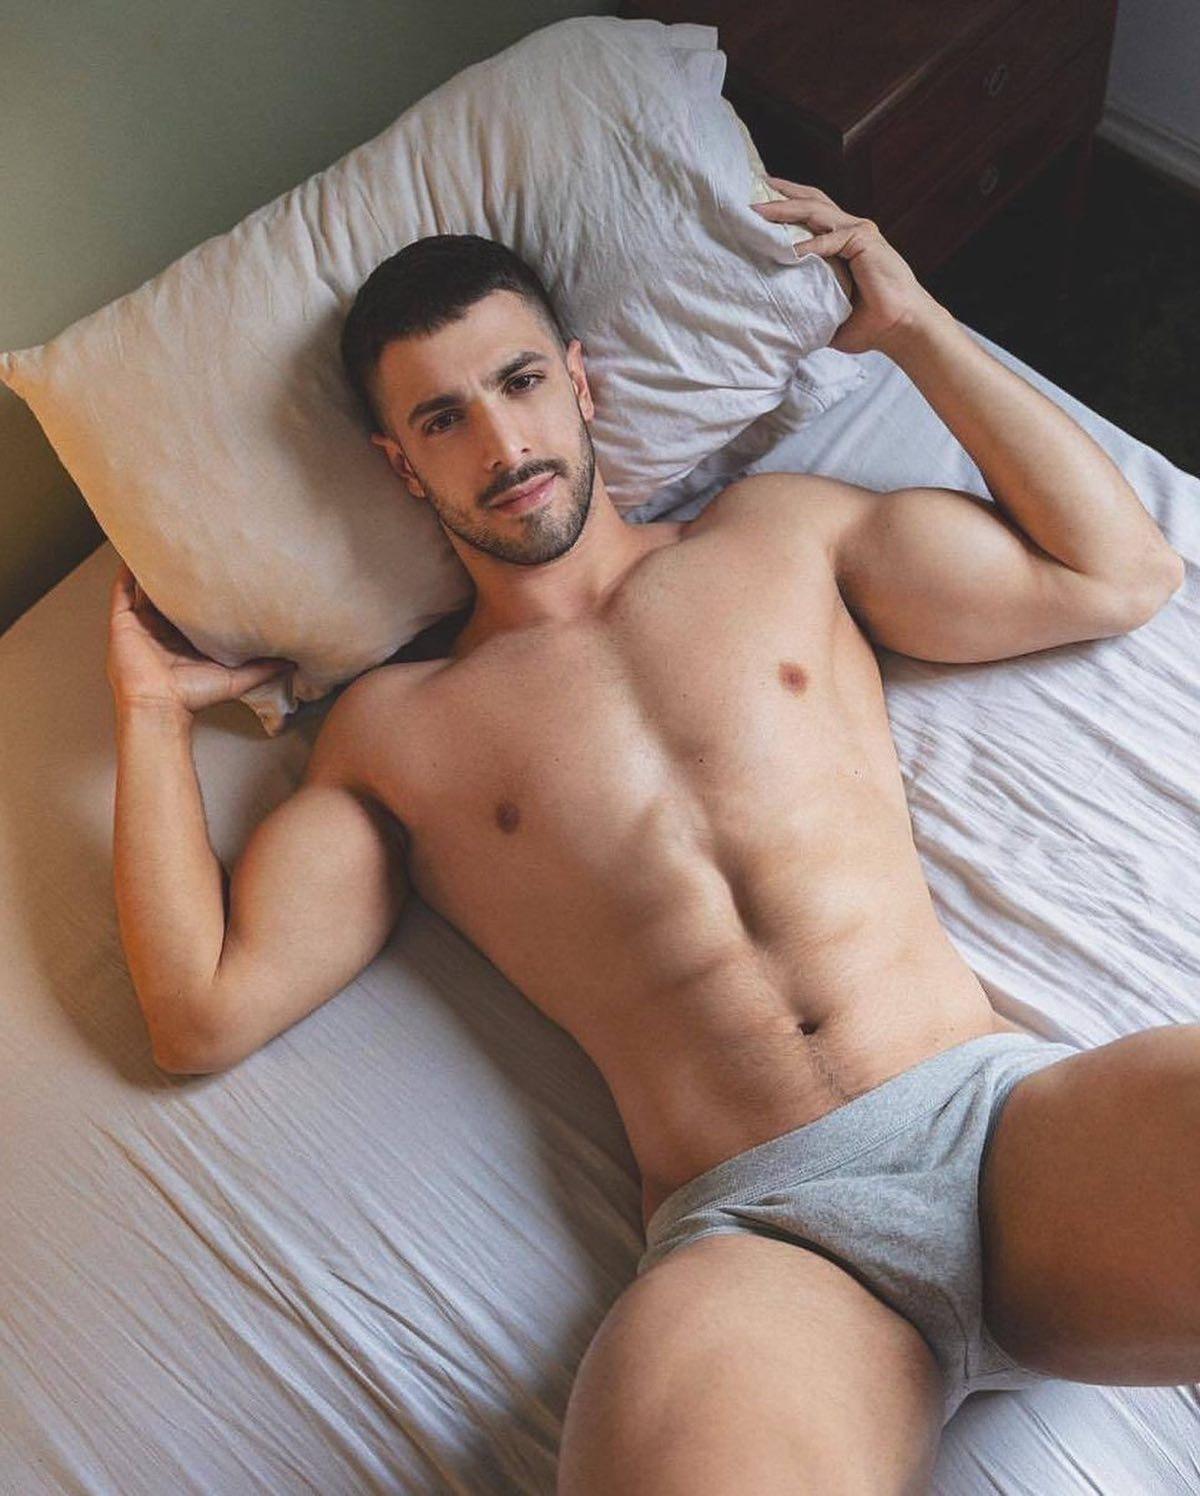 #men #hunks #muscular #bulge #underwear #briefs